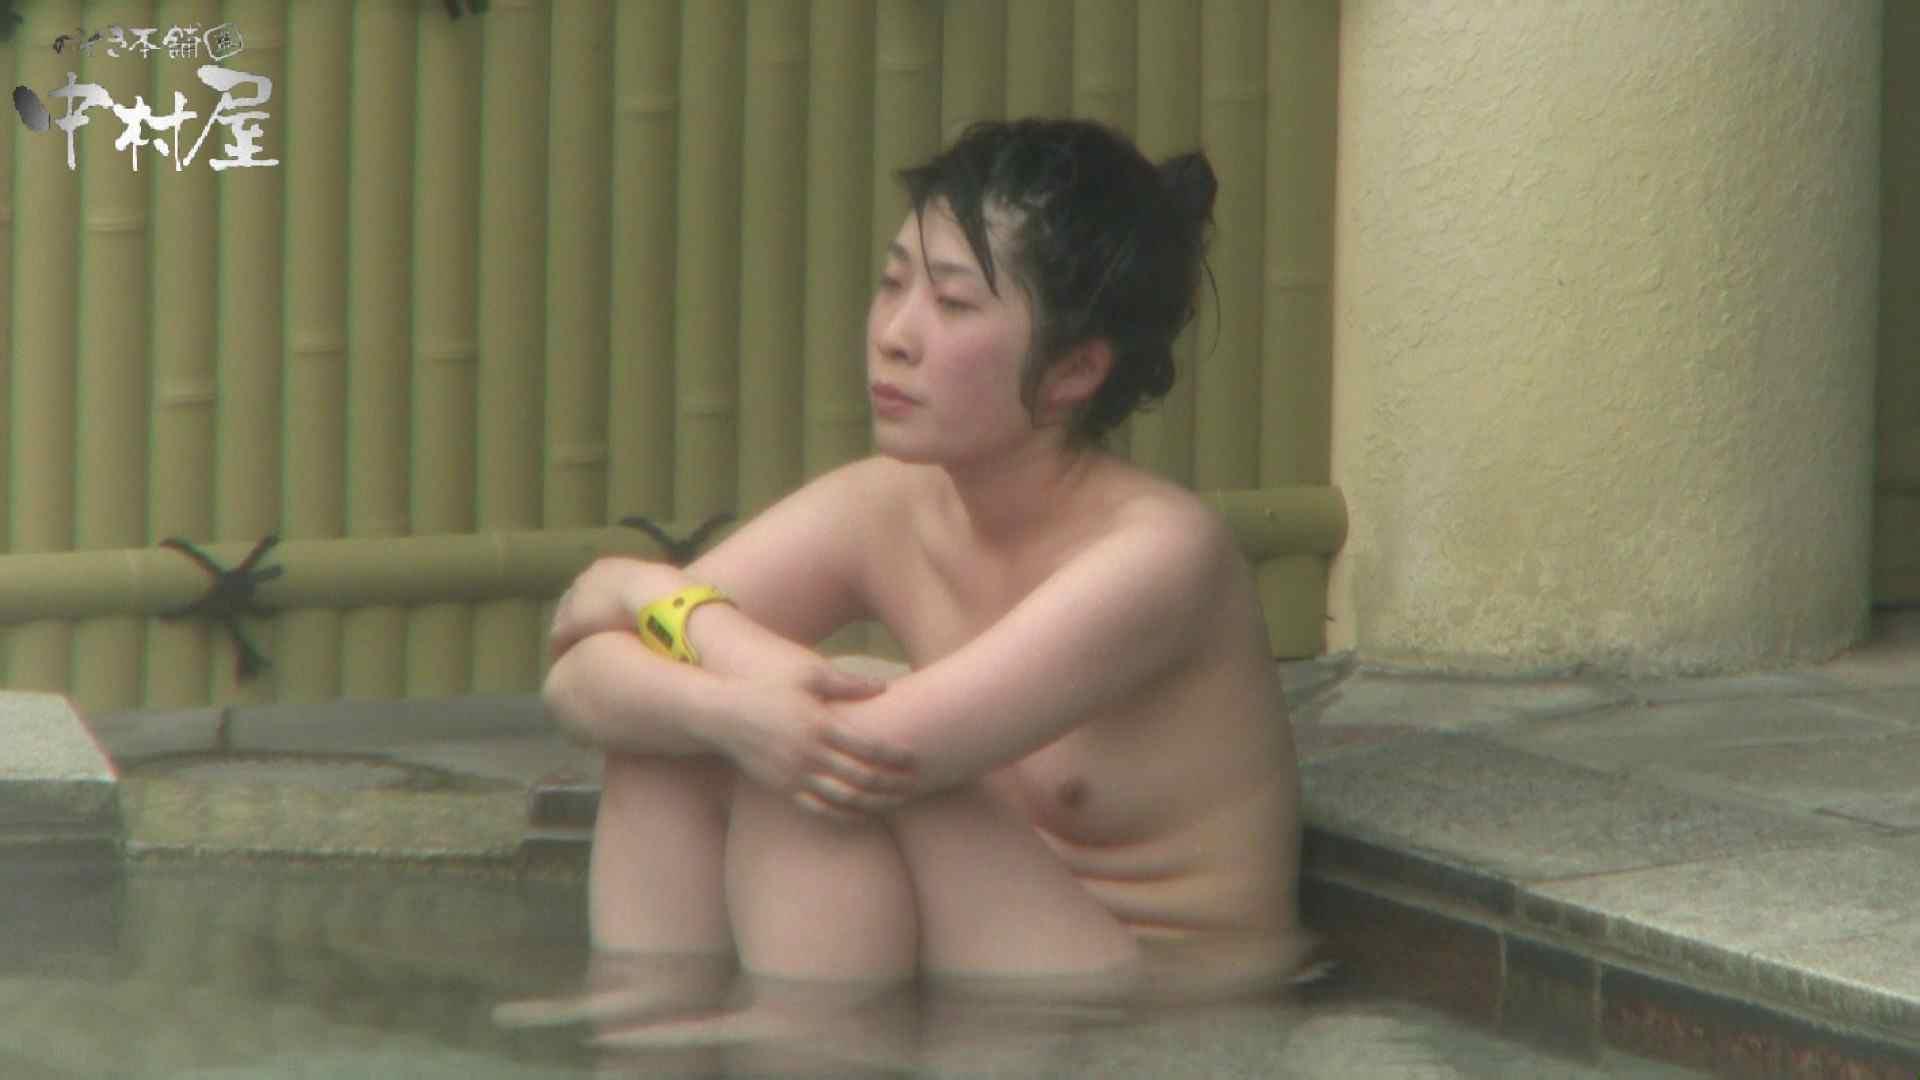 Aquaな露天風呂Vol.955 盗撮師作品 | 露天風呂突入  85pic 55